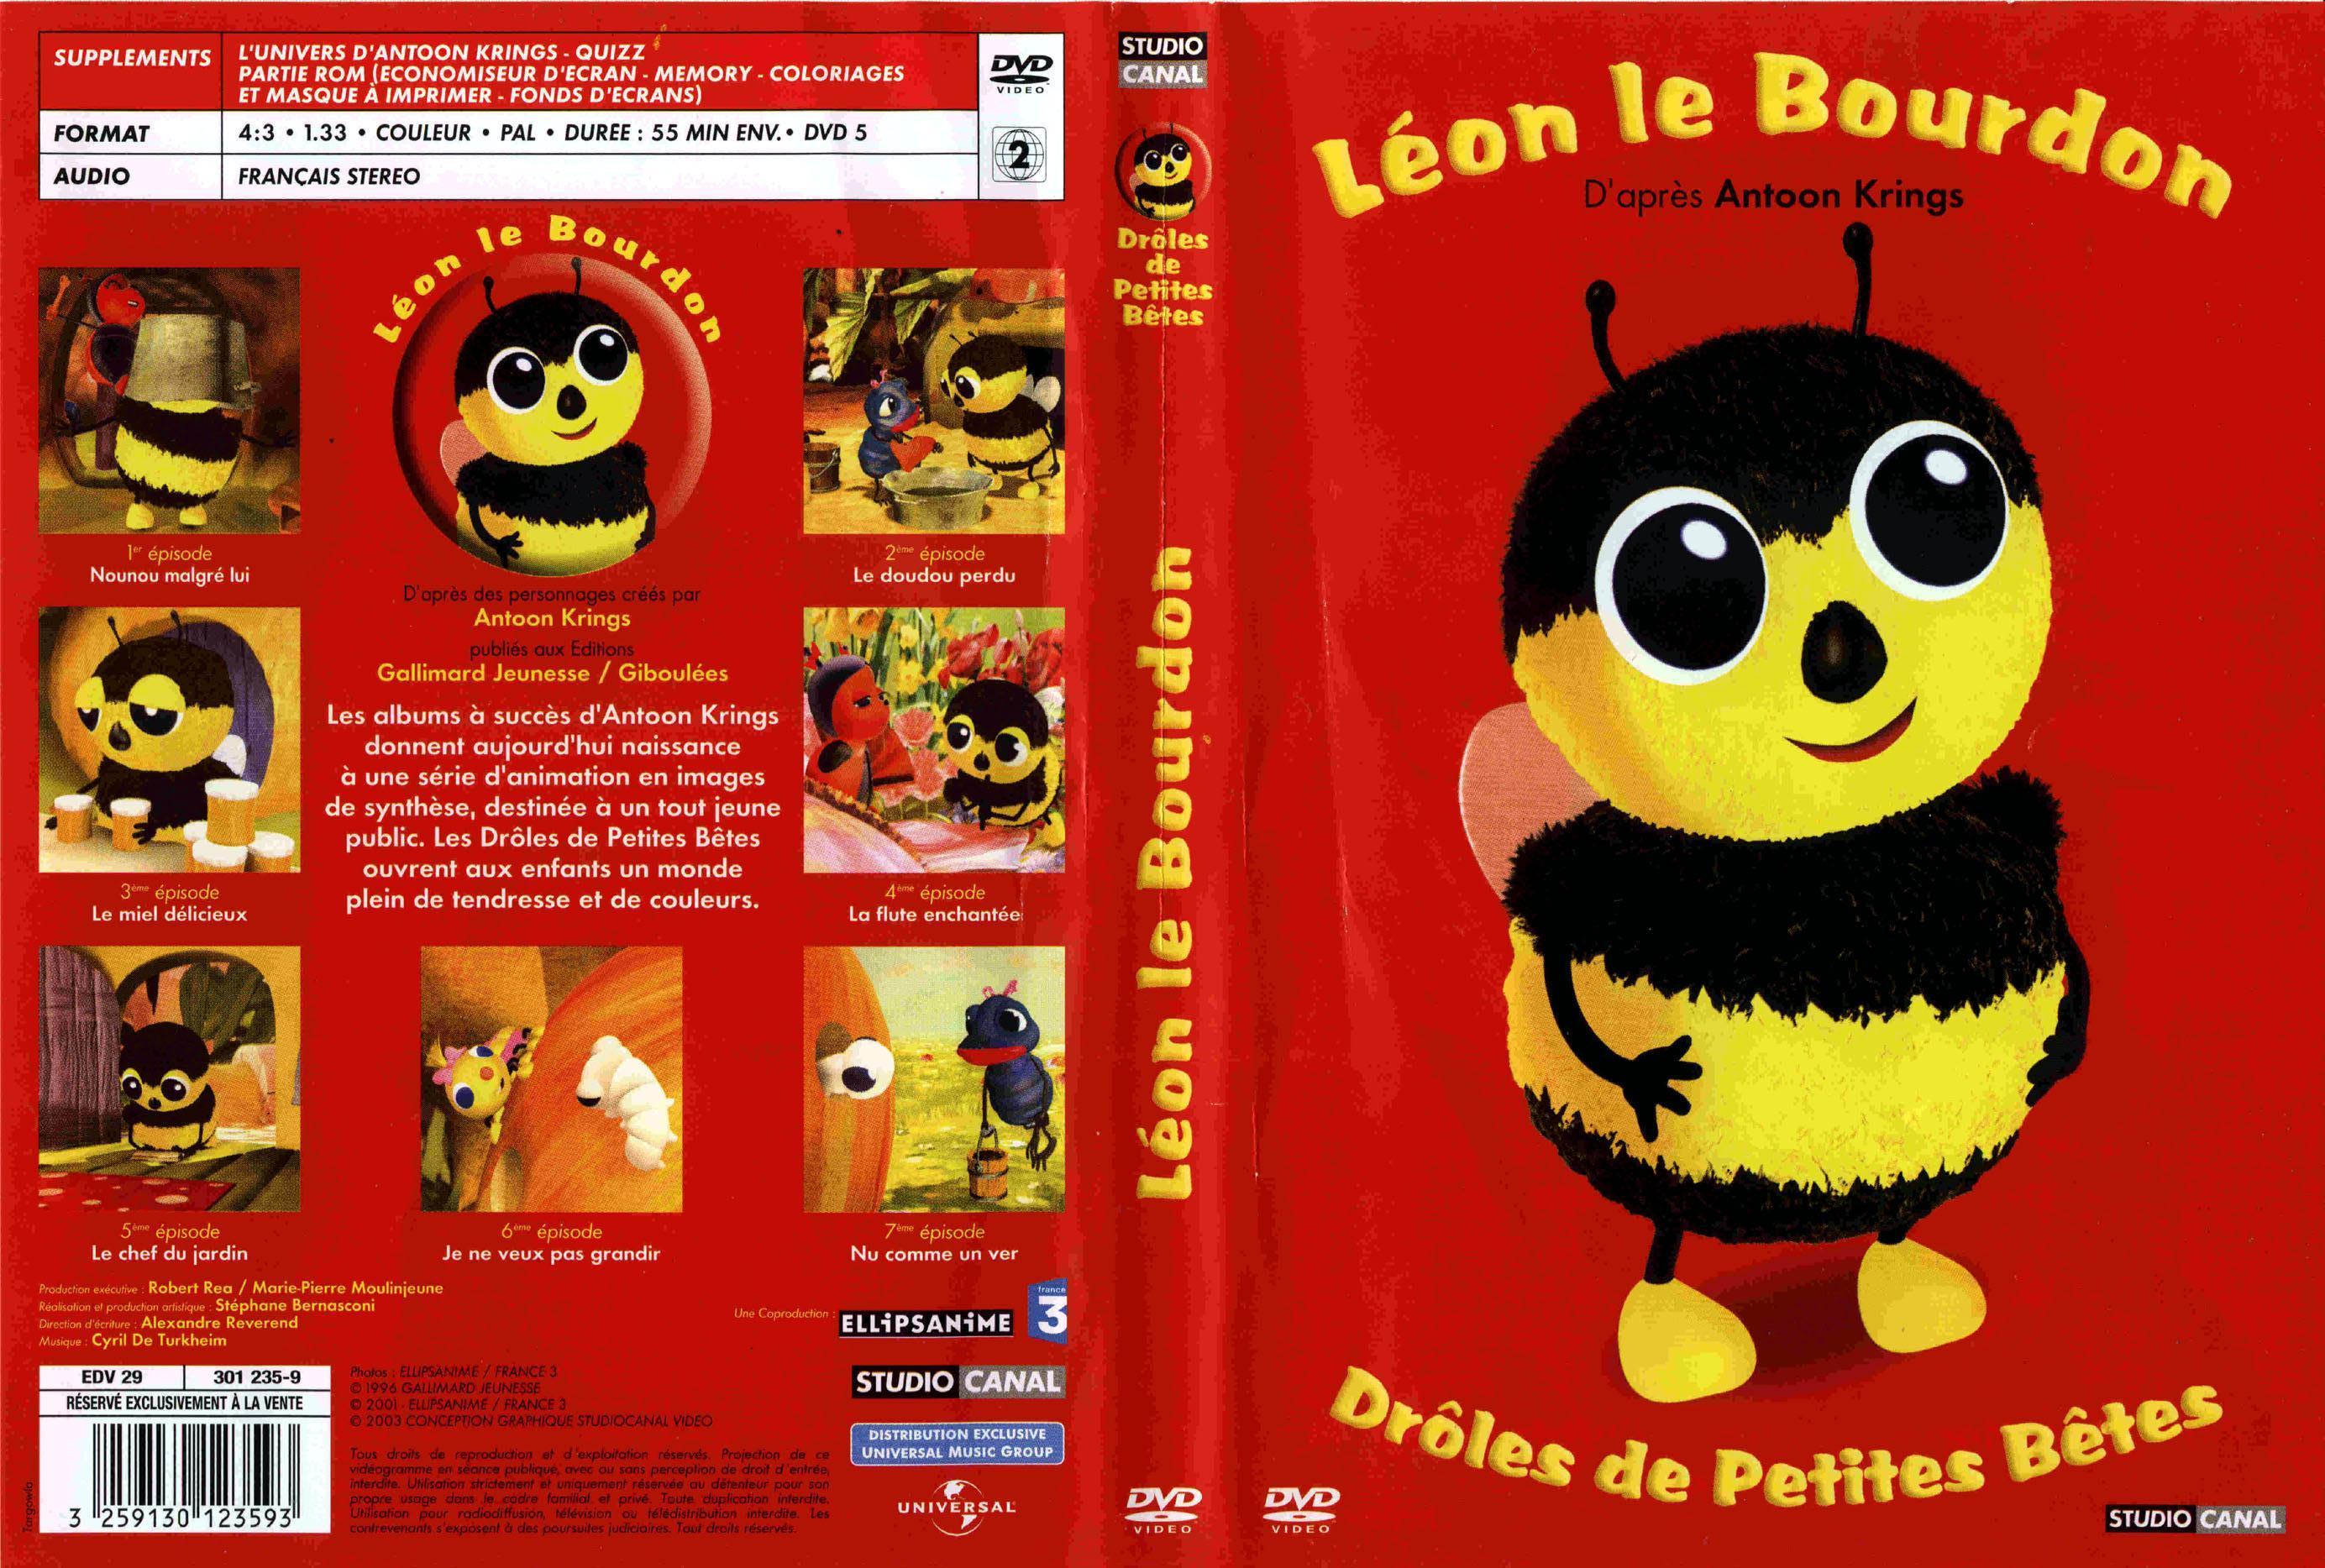 Bon Mercredi Leon%20le%20bourdon